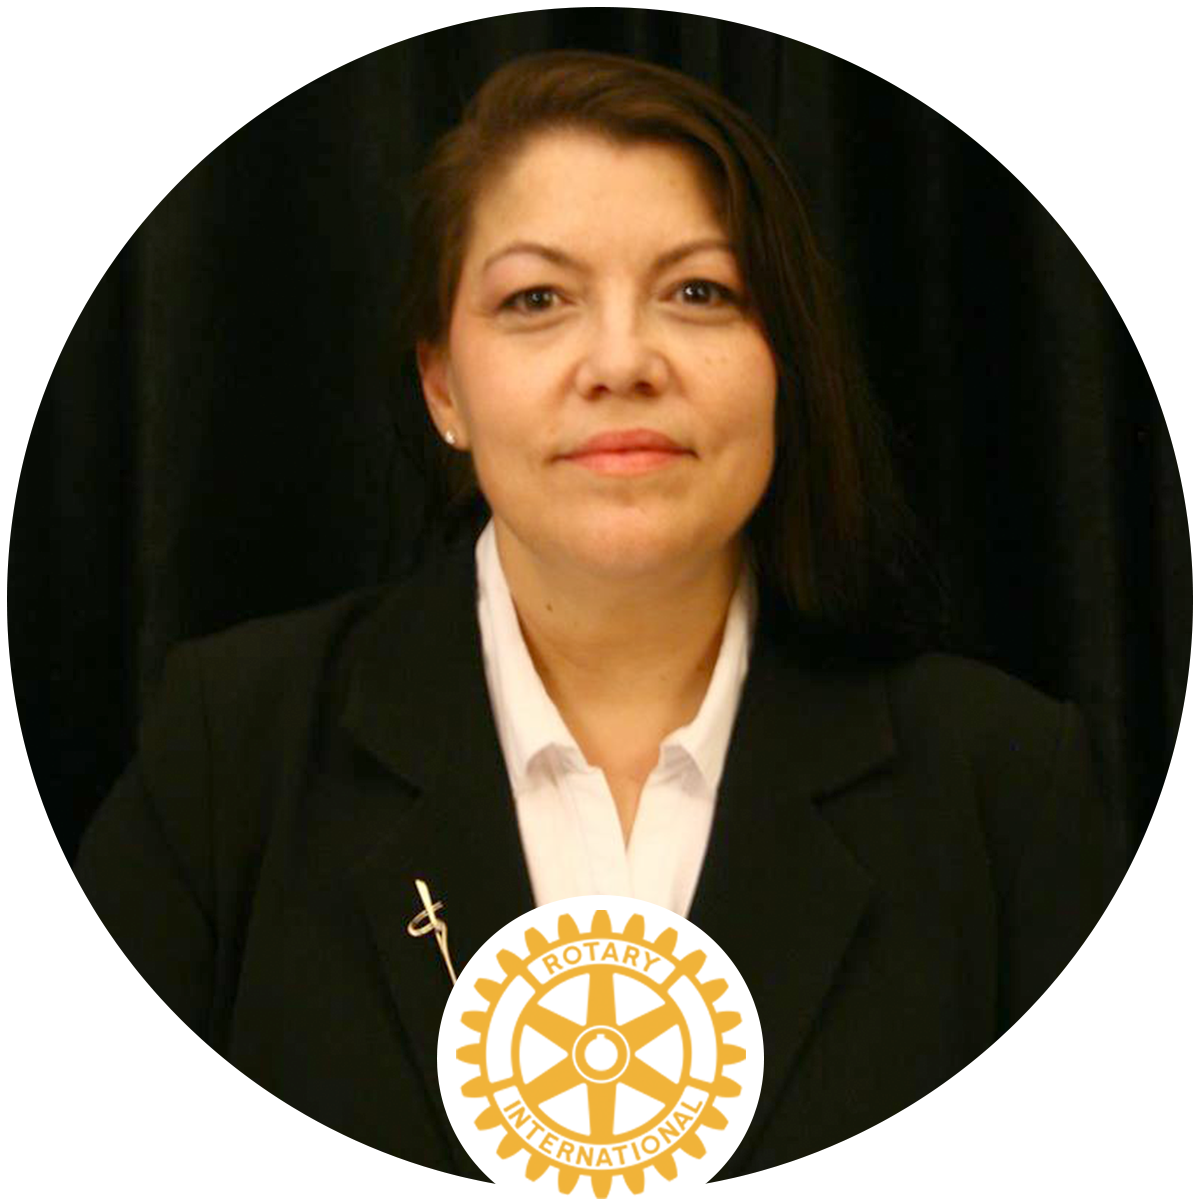 Cosmina Postescu